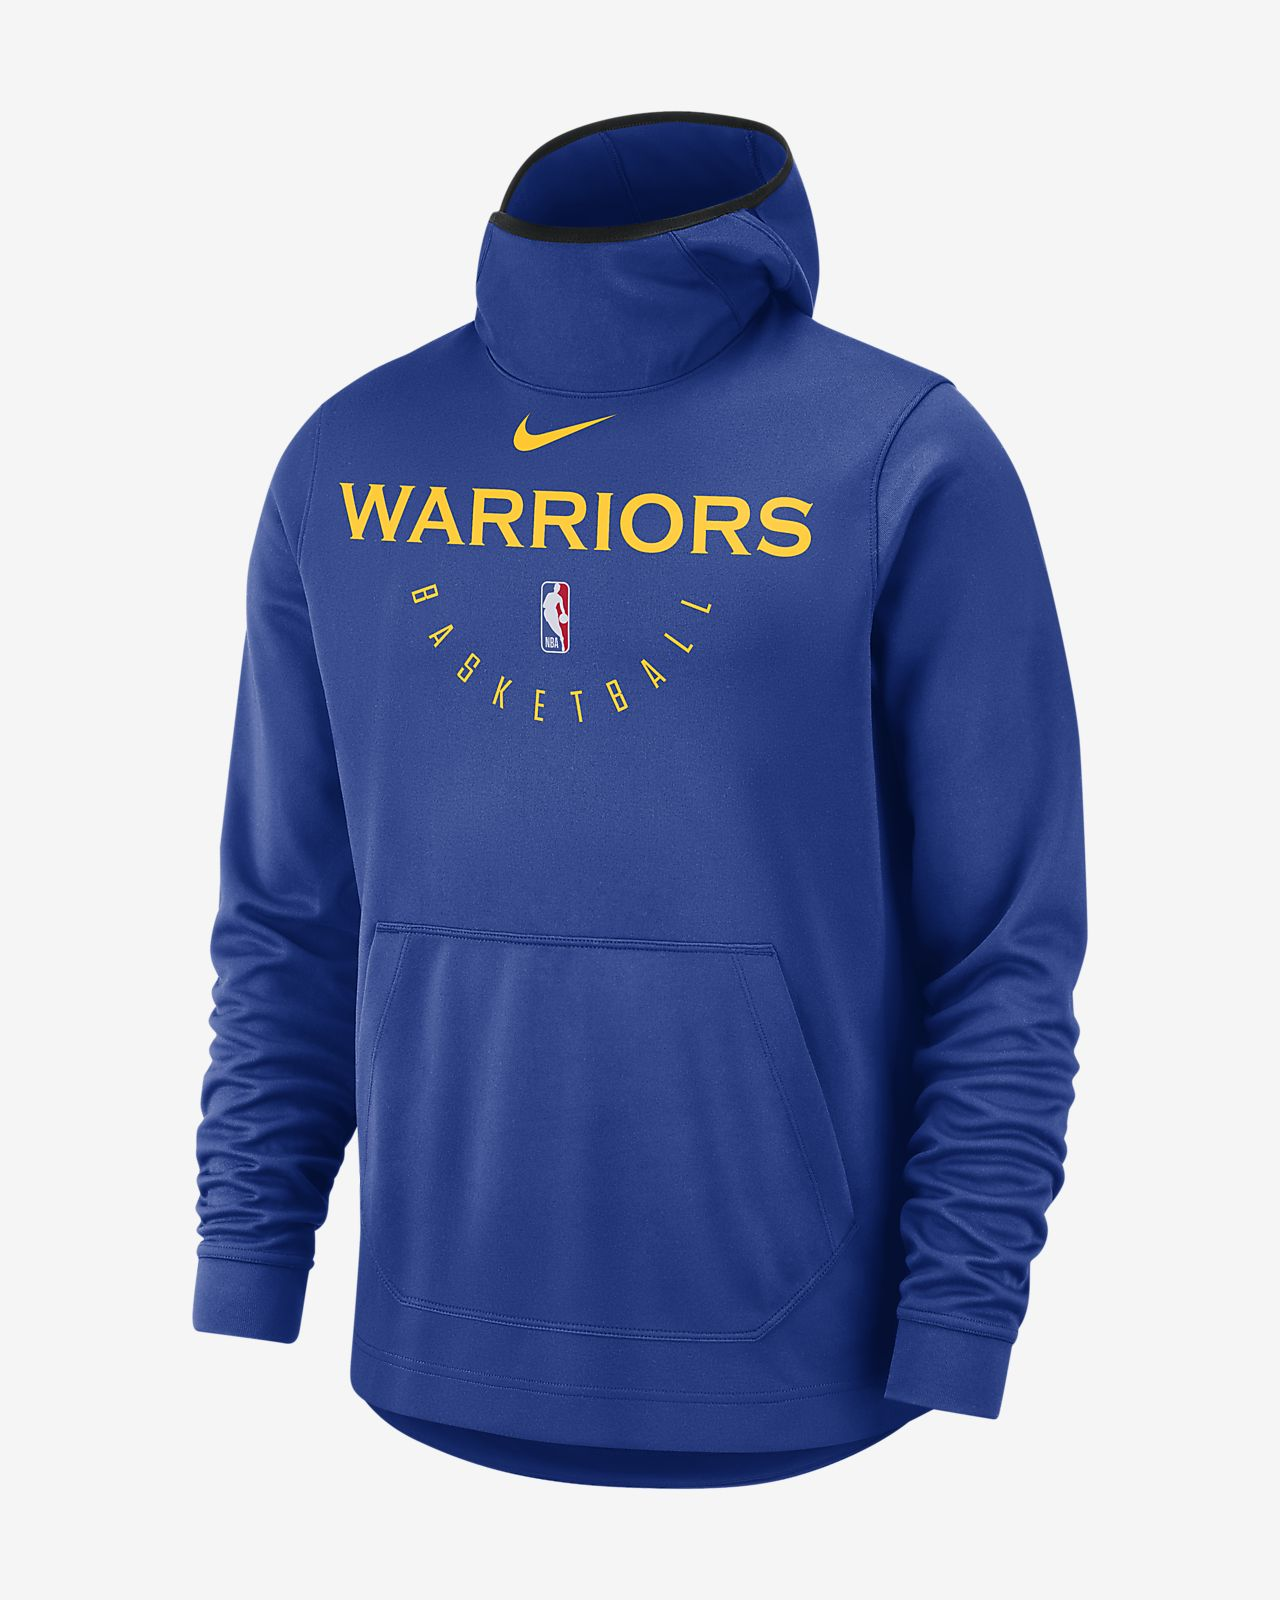 7aa4c3227f4 Golden State Warriors Nike Spotlight Men s NBA Hoodie. Nike.com IN